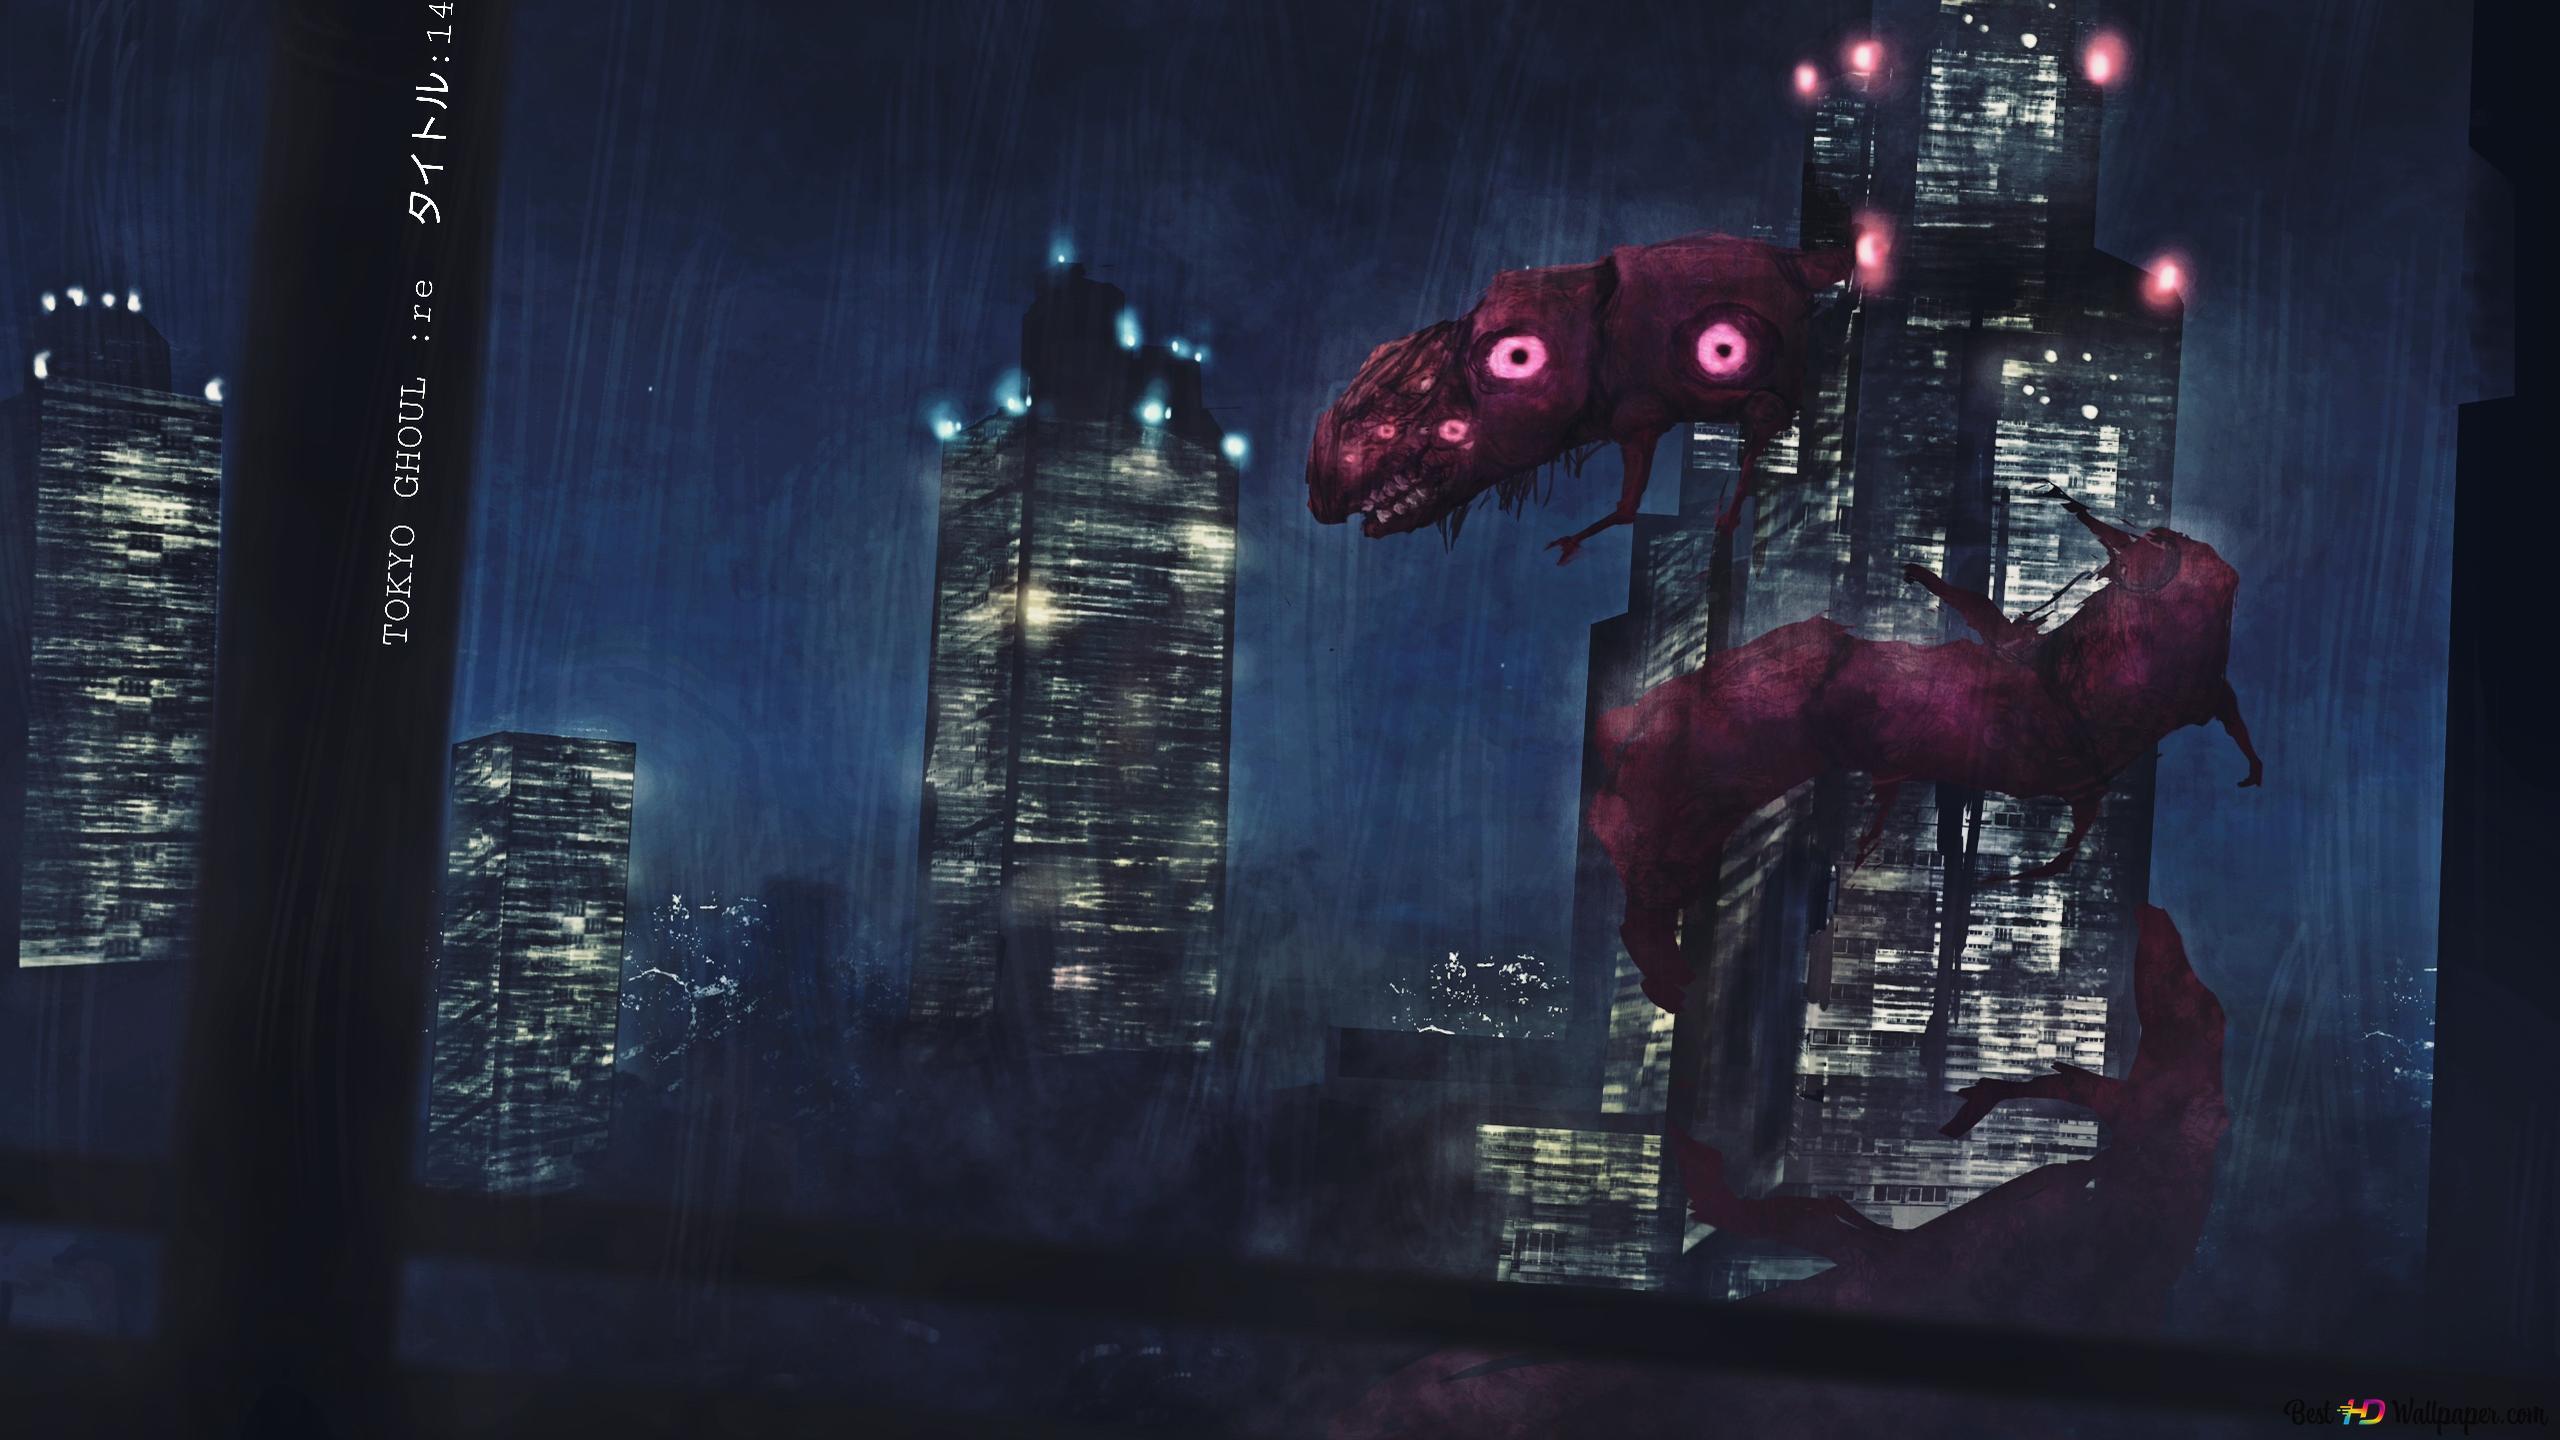 Descargar Fondo De Pantalla Tokio Ghoul Re Dragón Kaneki Hd